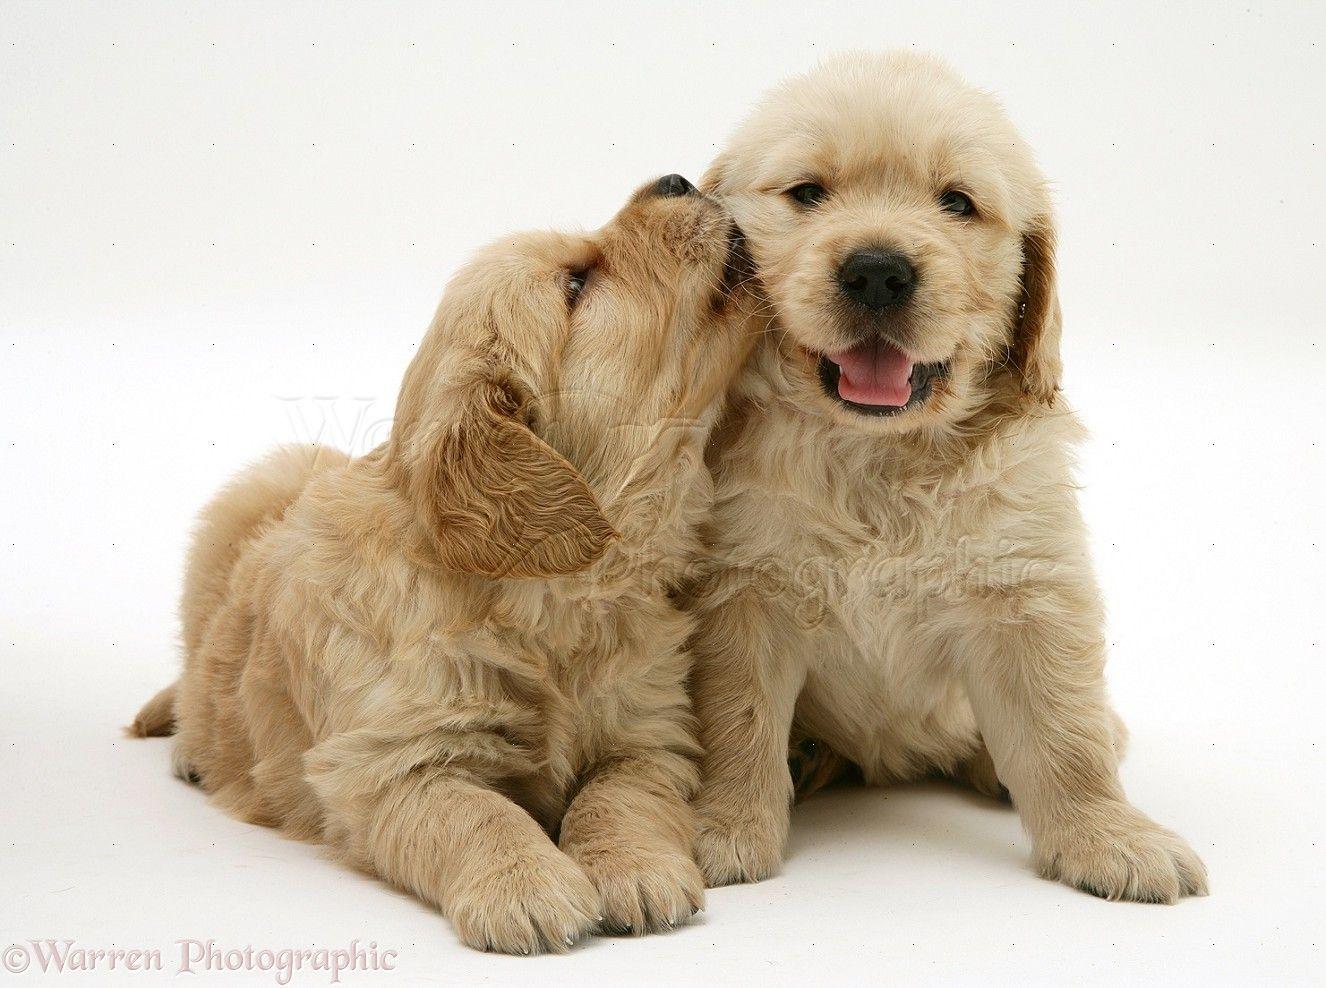 Cute Golden Retriever Puppies Kissing Puppies Cute Puppies Retriever Puppy